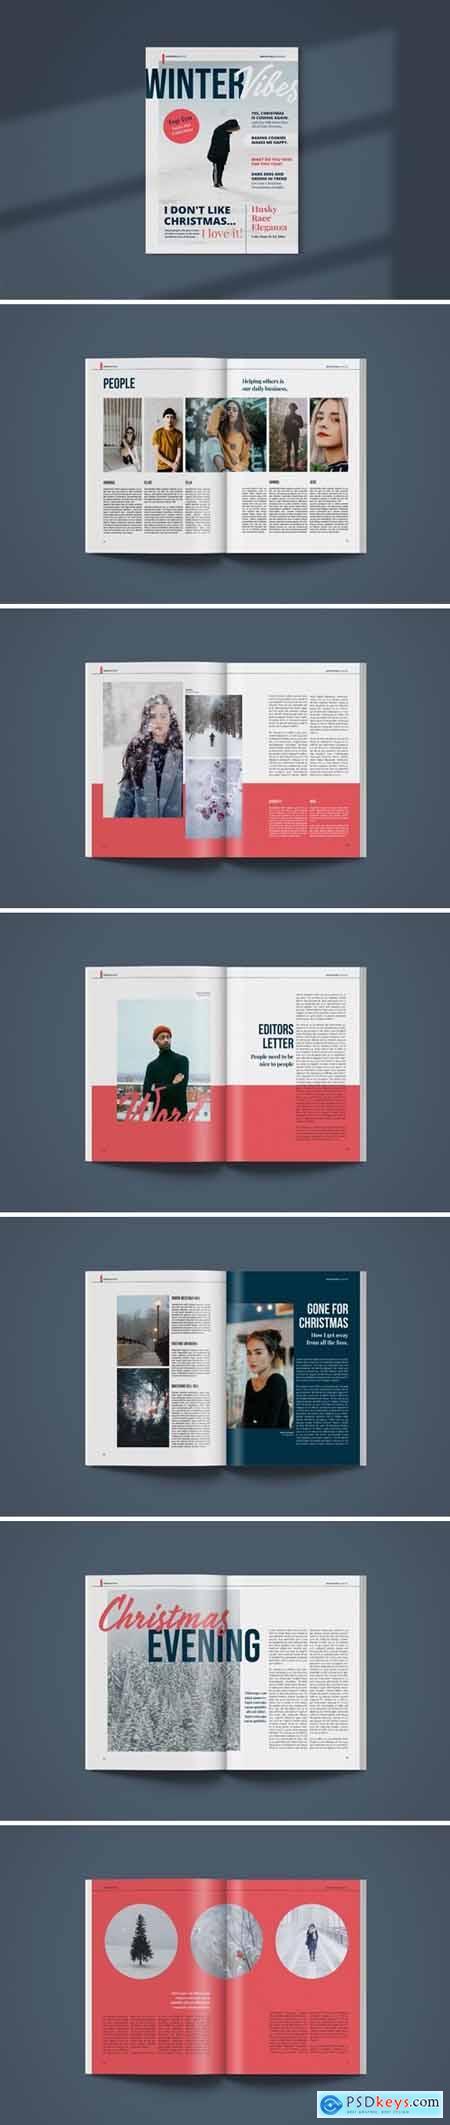 Magazine Template - Winter Vibes